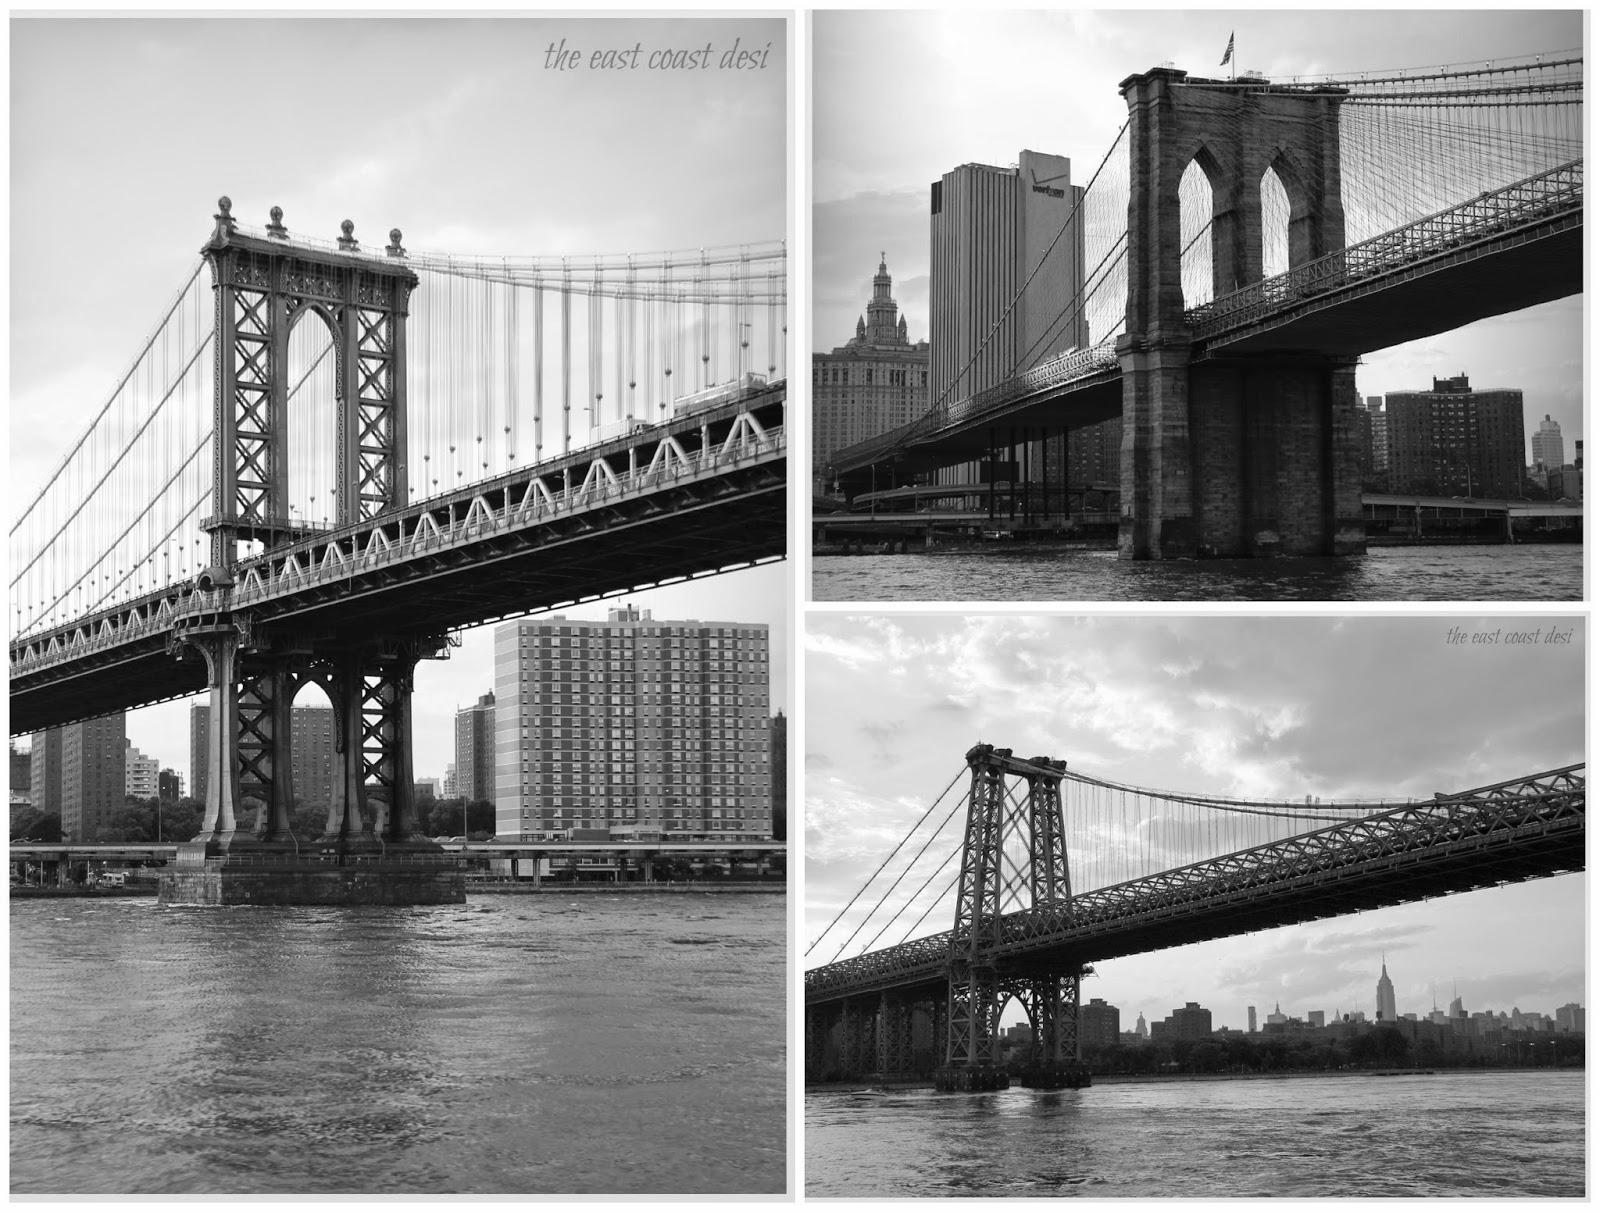 The East Coast Desi New York City Through My Lens Part 2